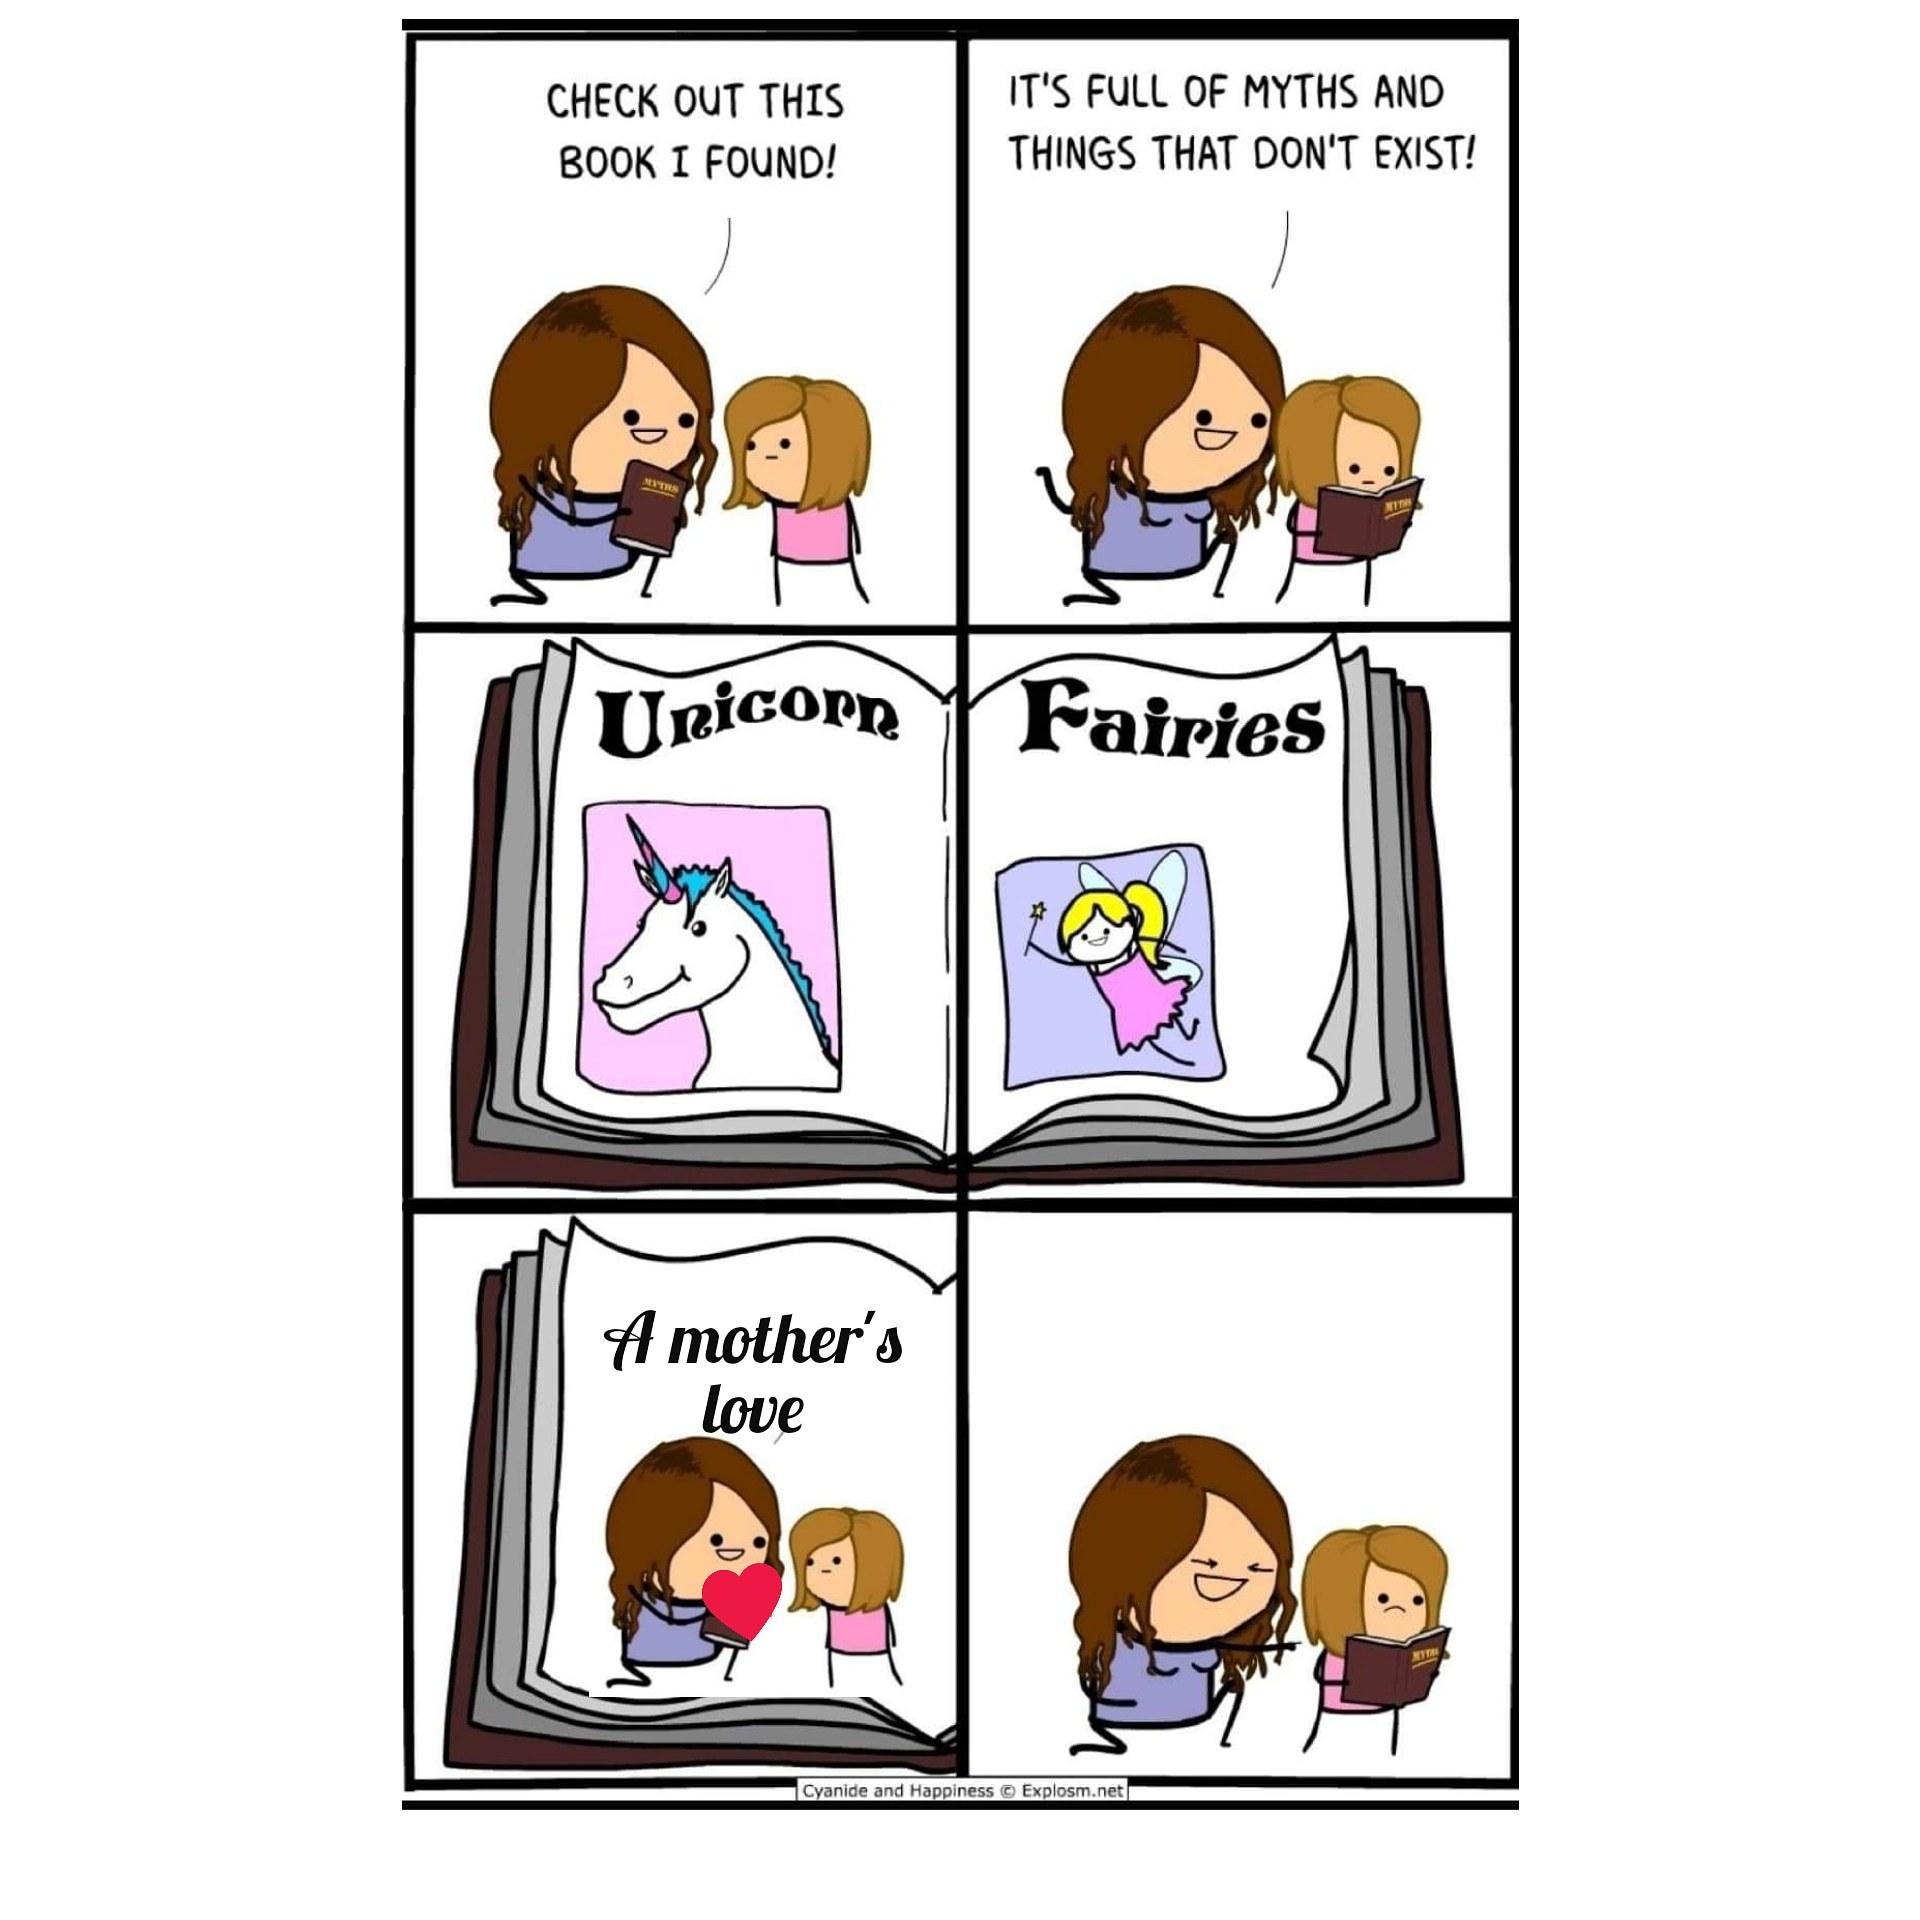 Mythical Things - meme